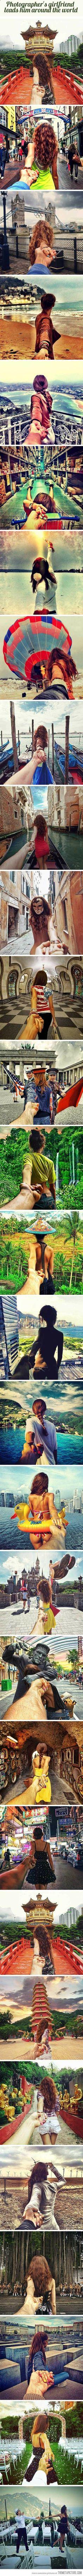 Photographers girlfriend leads him around the world... AWWWW